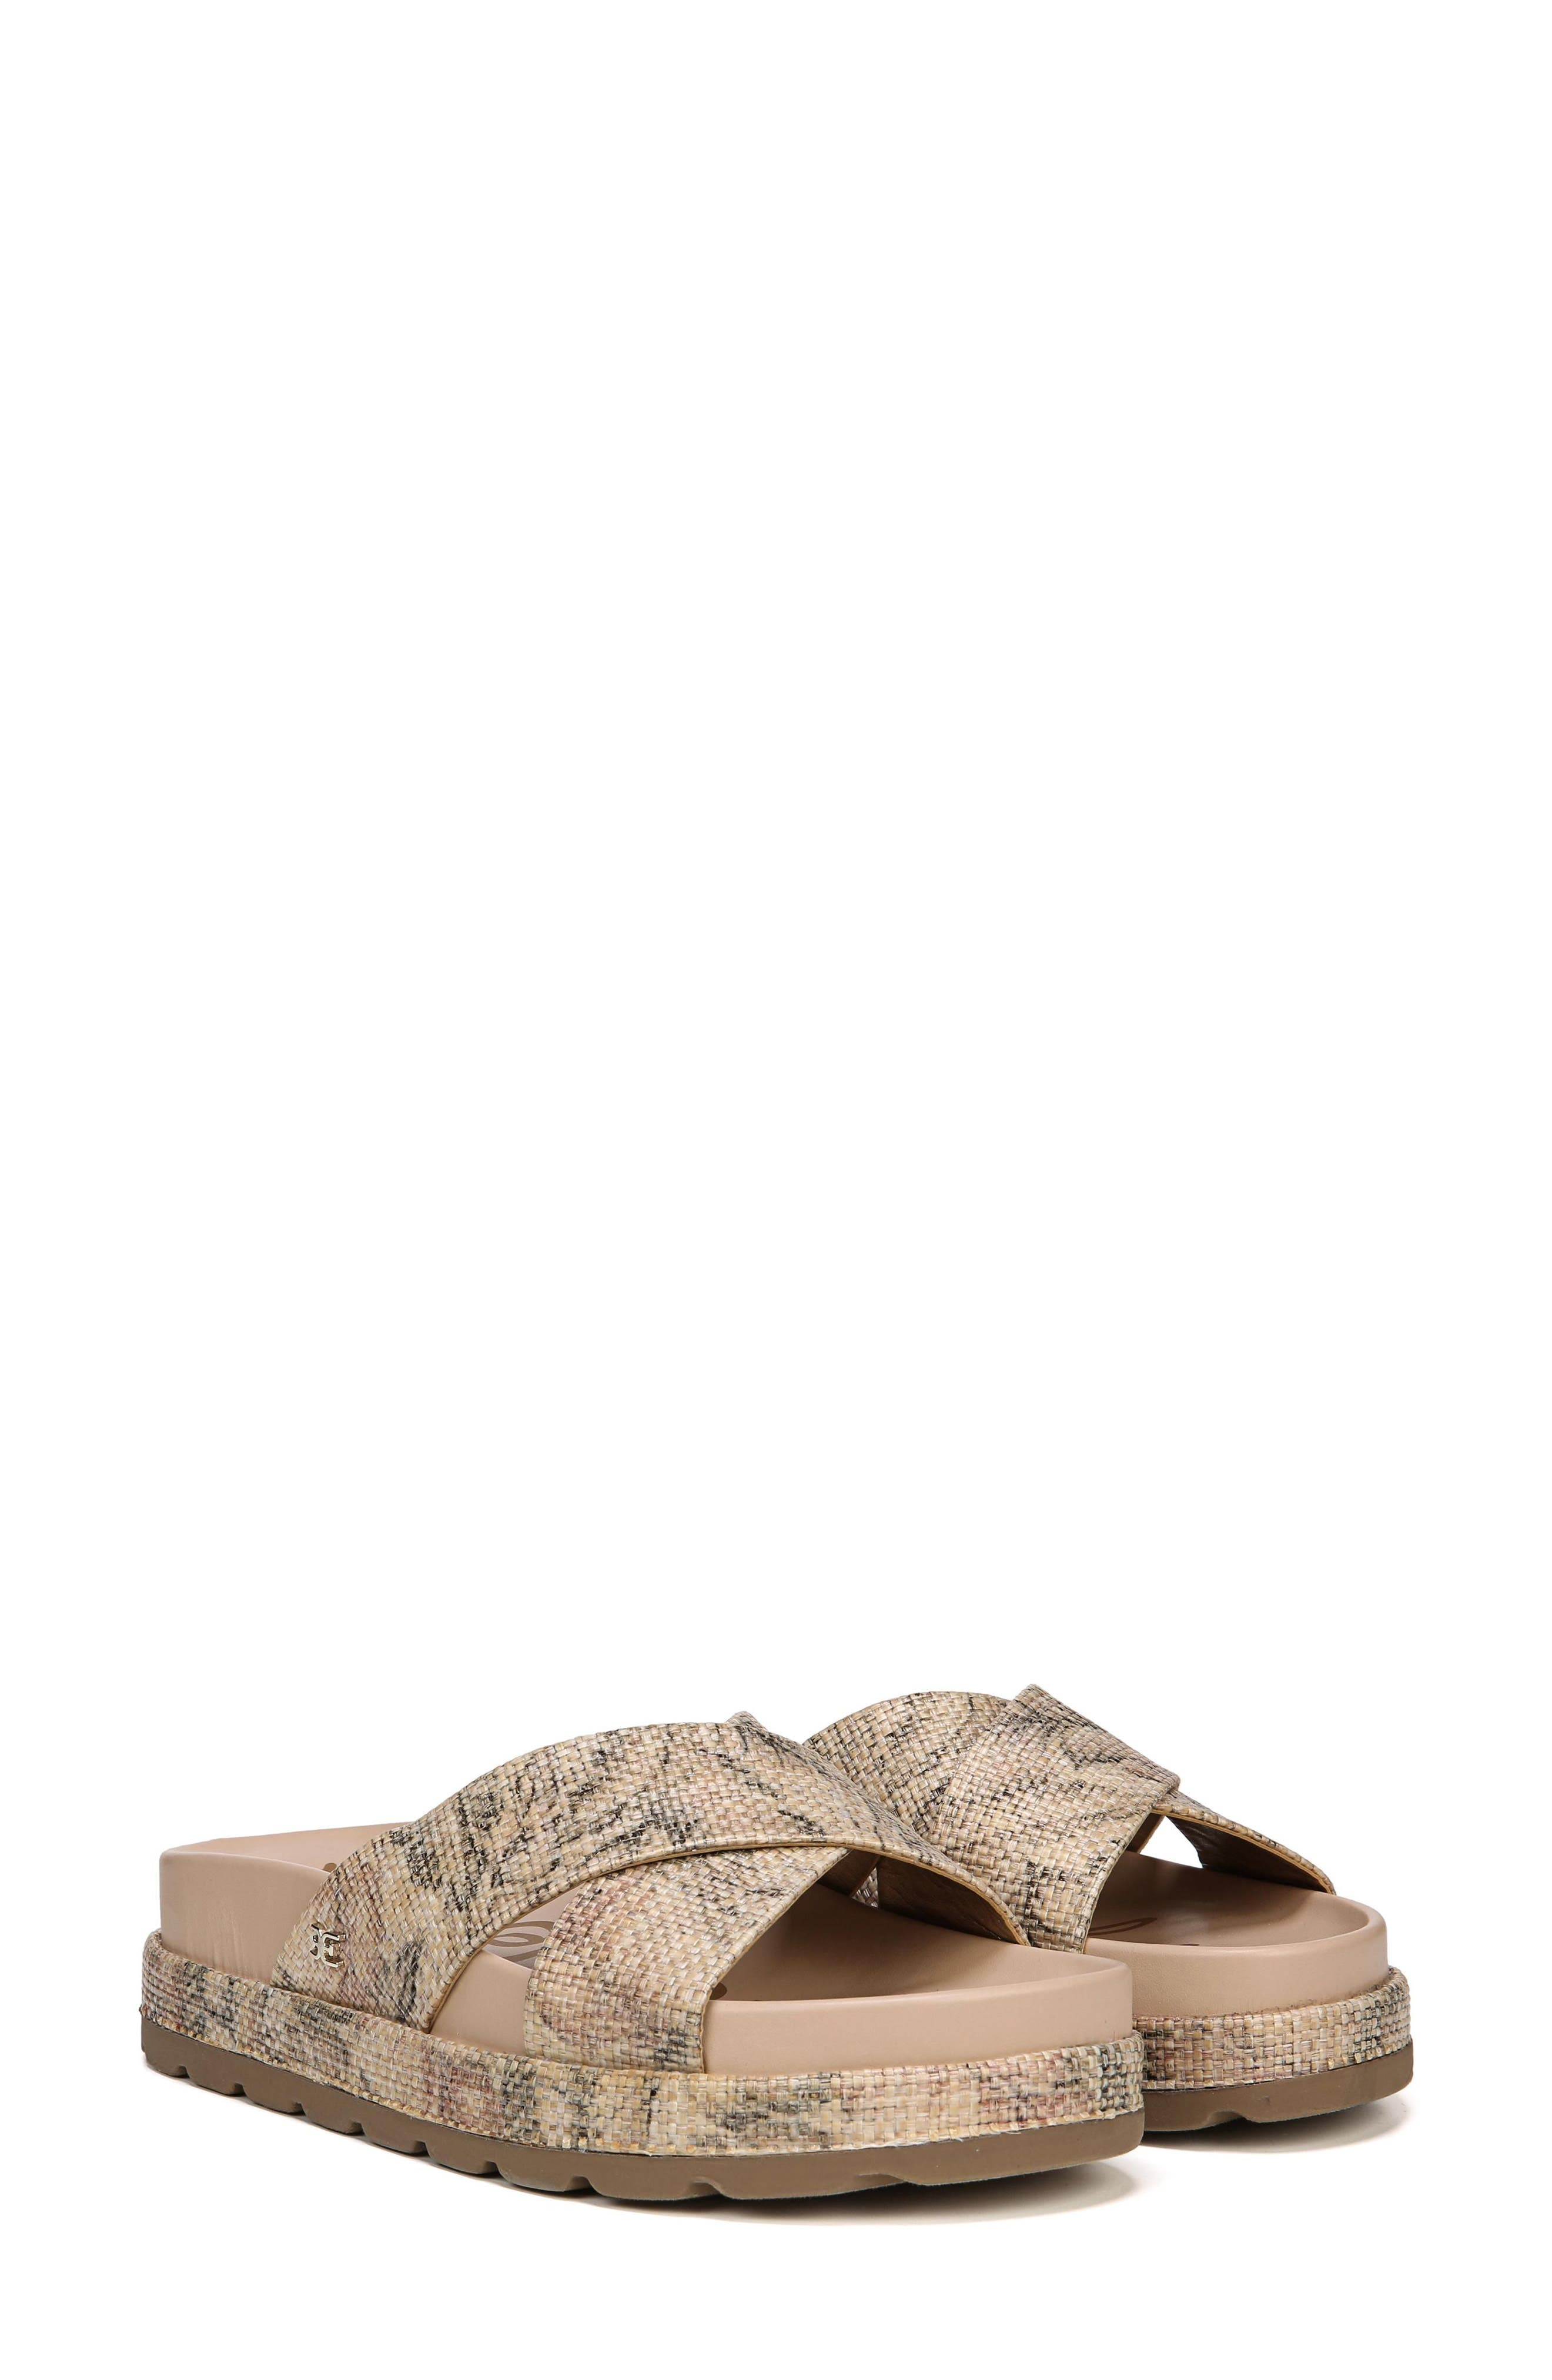 Sadia Slide Sandal, Main, color, 250